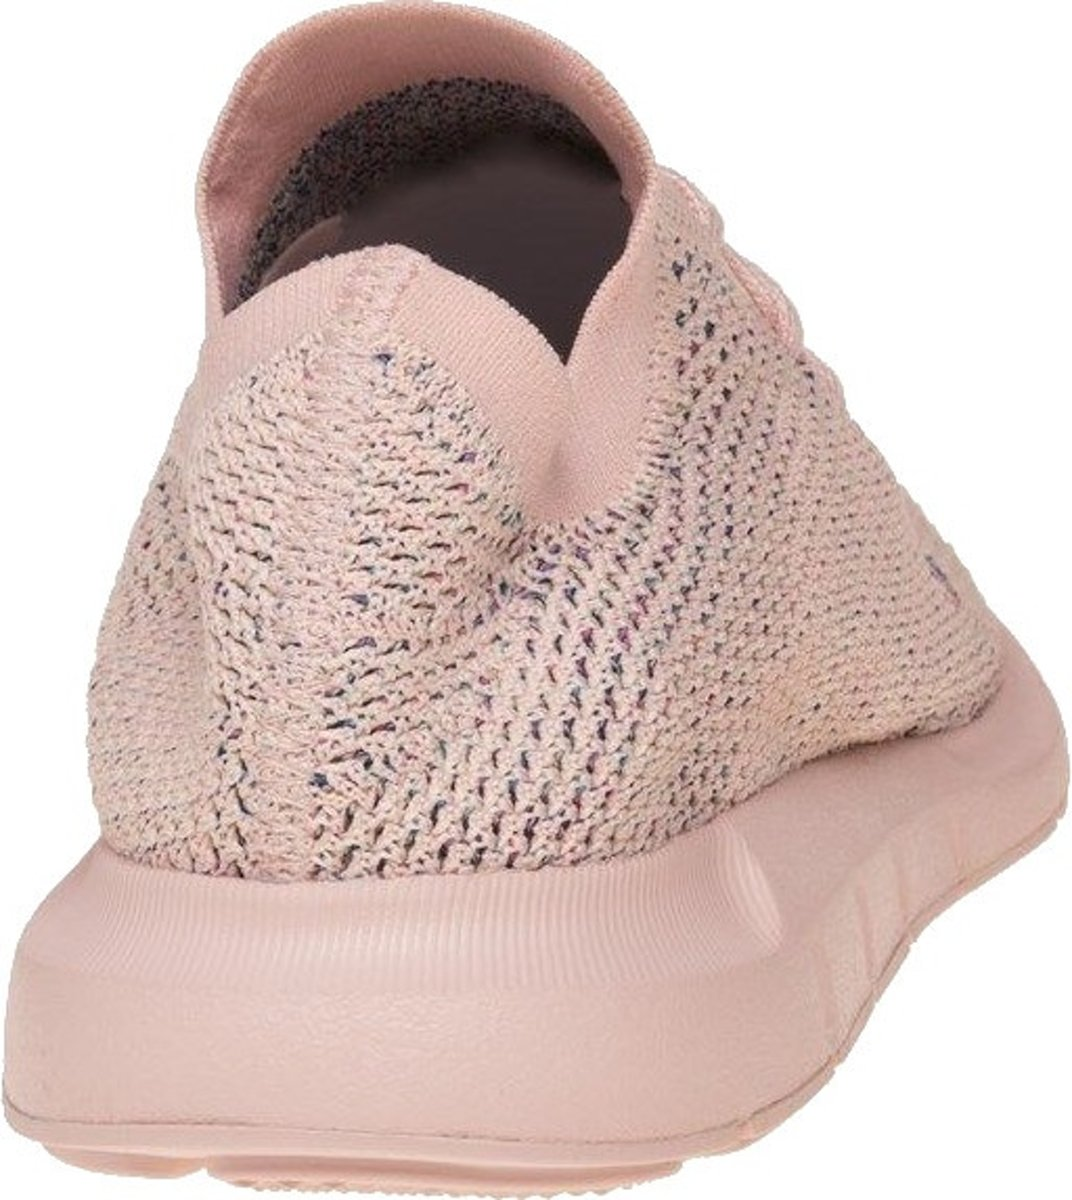 3e25fa1da95 bol.com | Adidas Sneakers Swift Run Primeknit Dames Zalmroze Maat 42